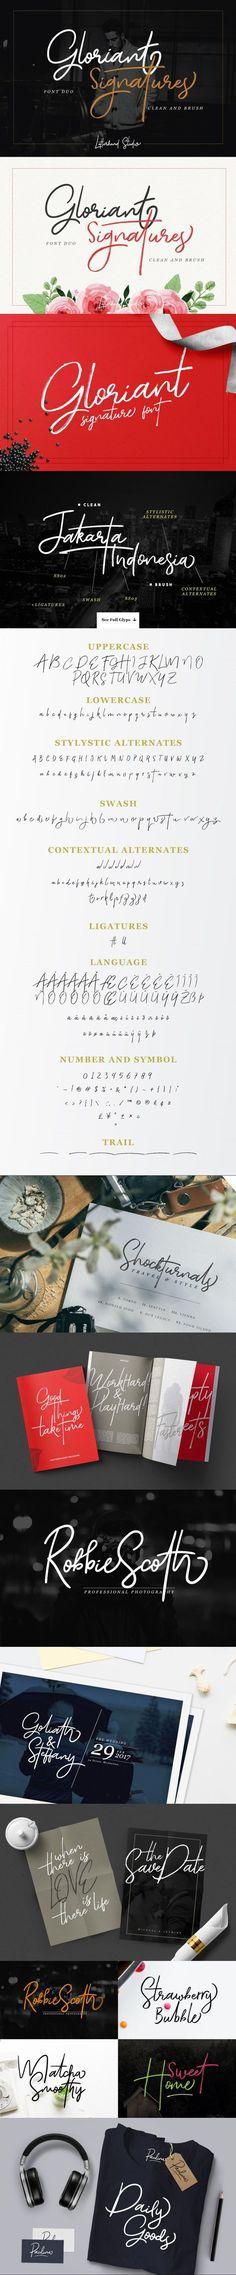 Gloriant Signature Script #handwriting #ttf #logotype #lettering #newyear #WeddingDesign #fontduo #wedding #opentypefont #newyear #card #clean #quote #elegant #CalligraphicFont #popular #rough #feminine #scriptfont Cursive Fonts, Calligraphy Fonts, Typography Fonts, Typography Design, Lettering, Wedding Fonts, Wedding Invitations, Truetype Fonts, Vintage Fonts